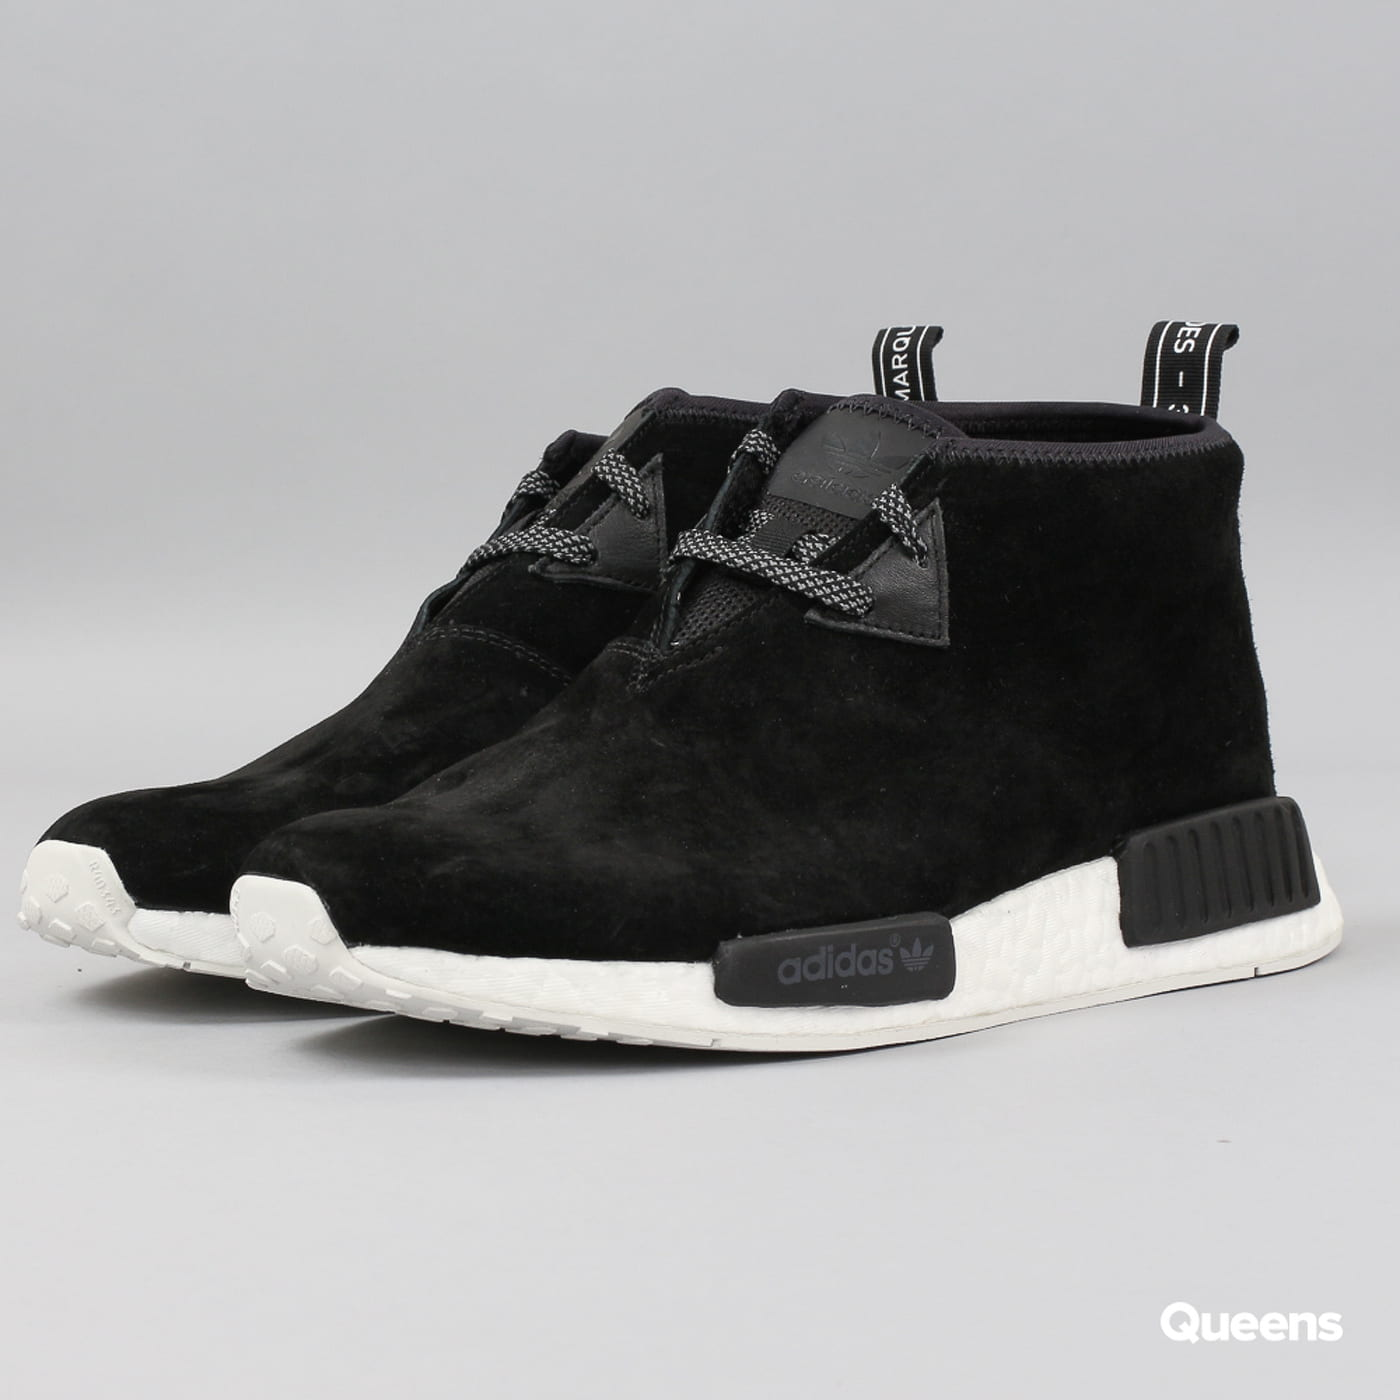 adidas Originals NMD_C1 cblack / cblack / chalk white